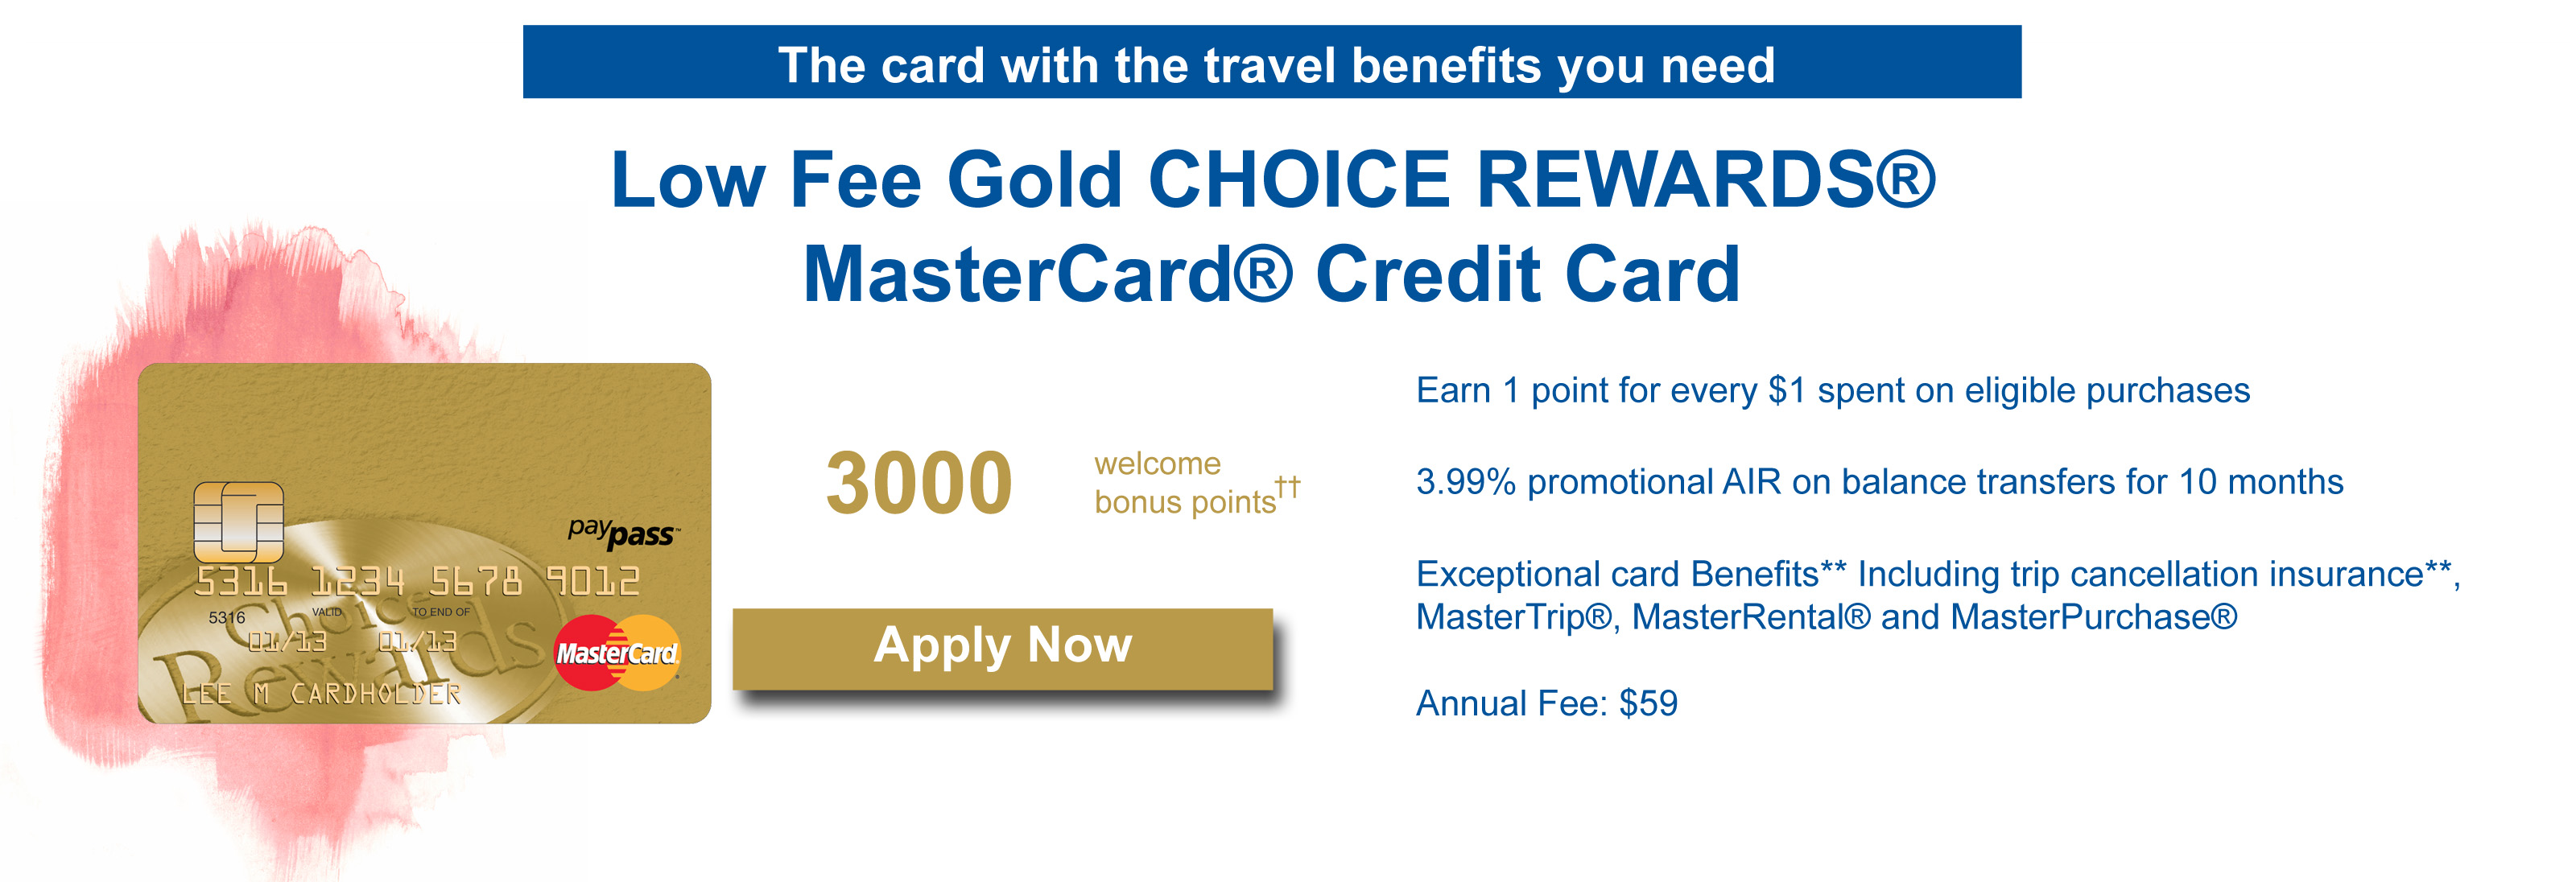 Gold Low fee choice rewards